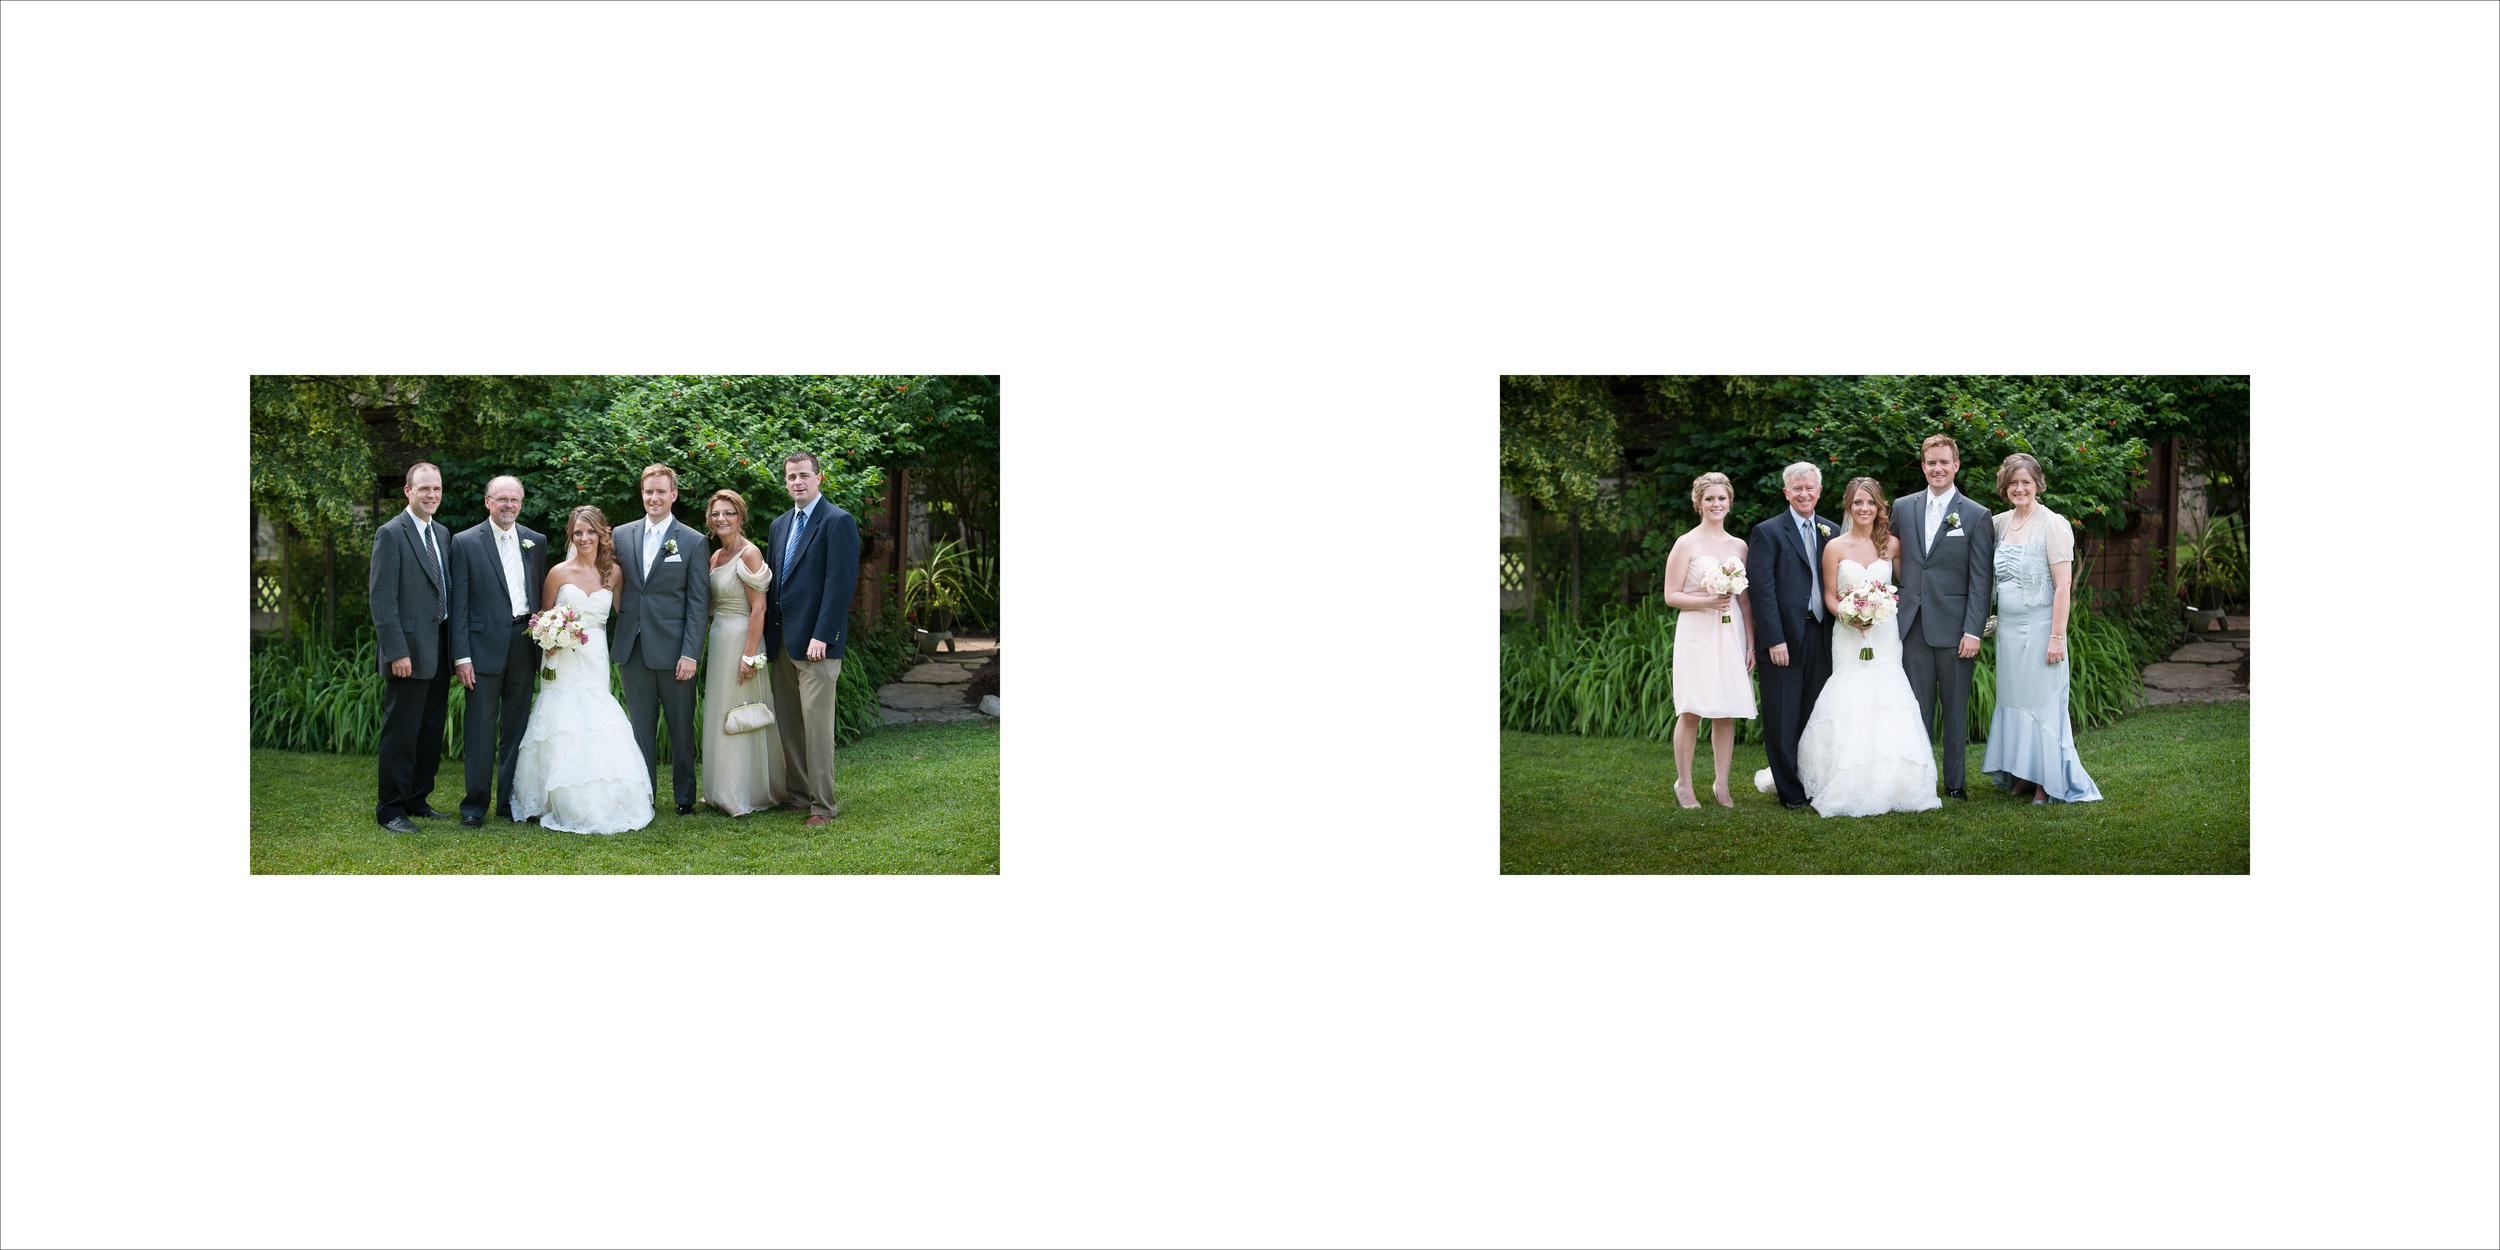 nith-ridge-wedding-album12.jpg